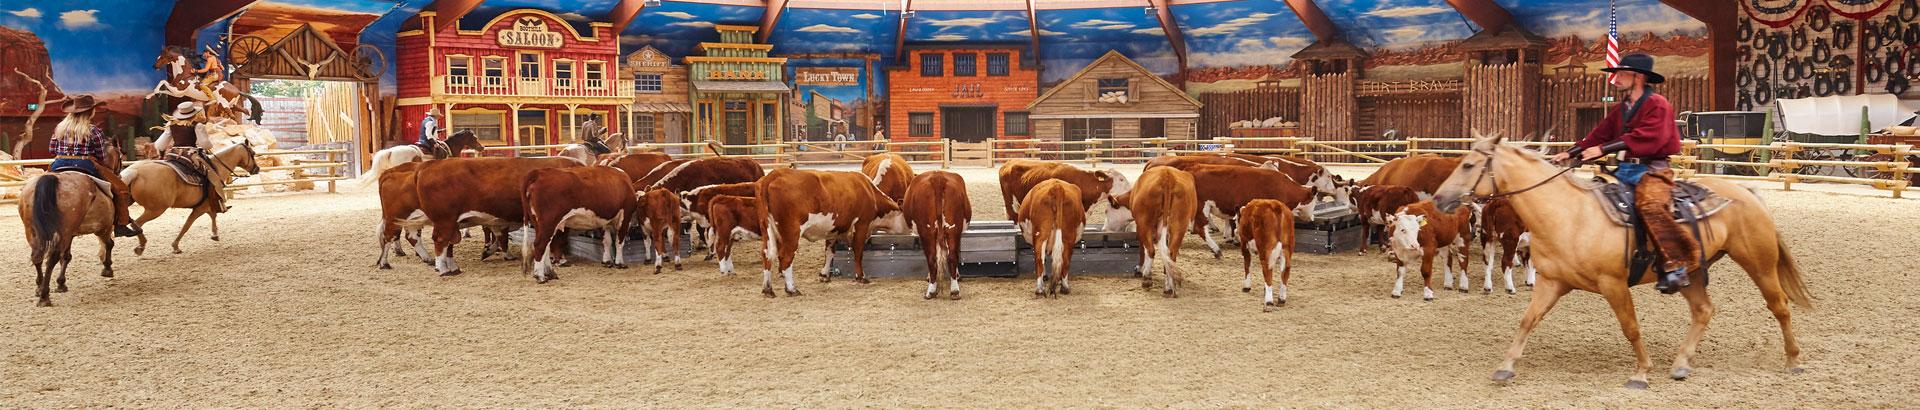 cowboyshow4